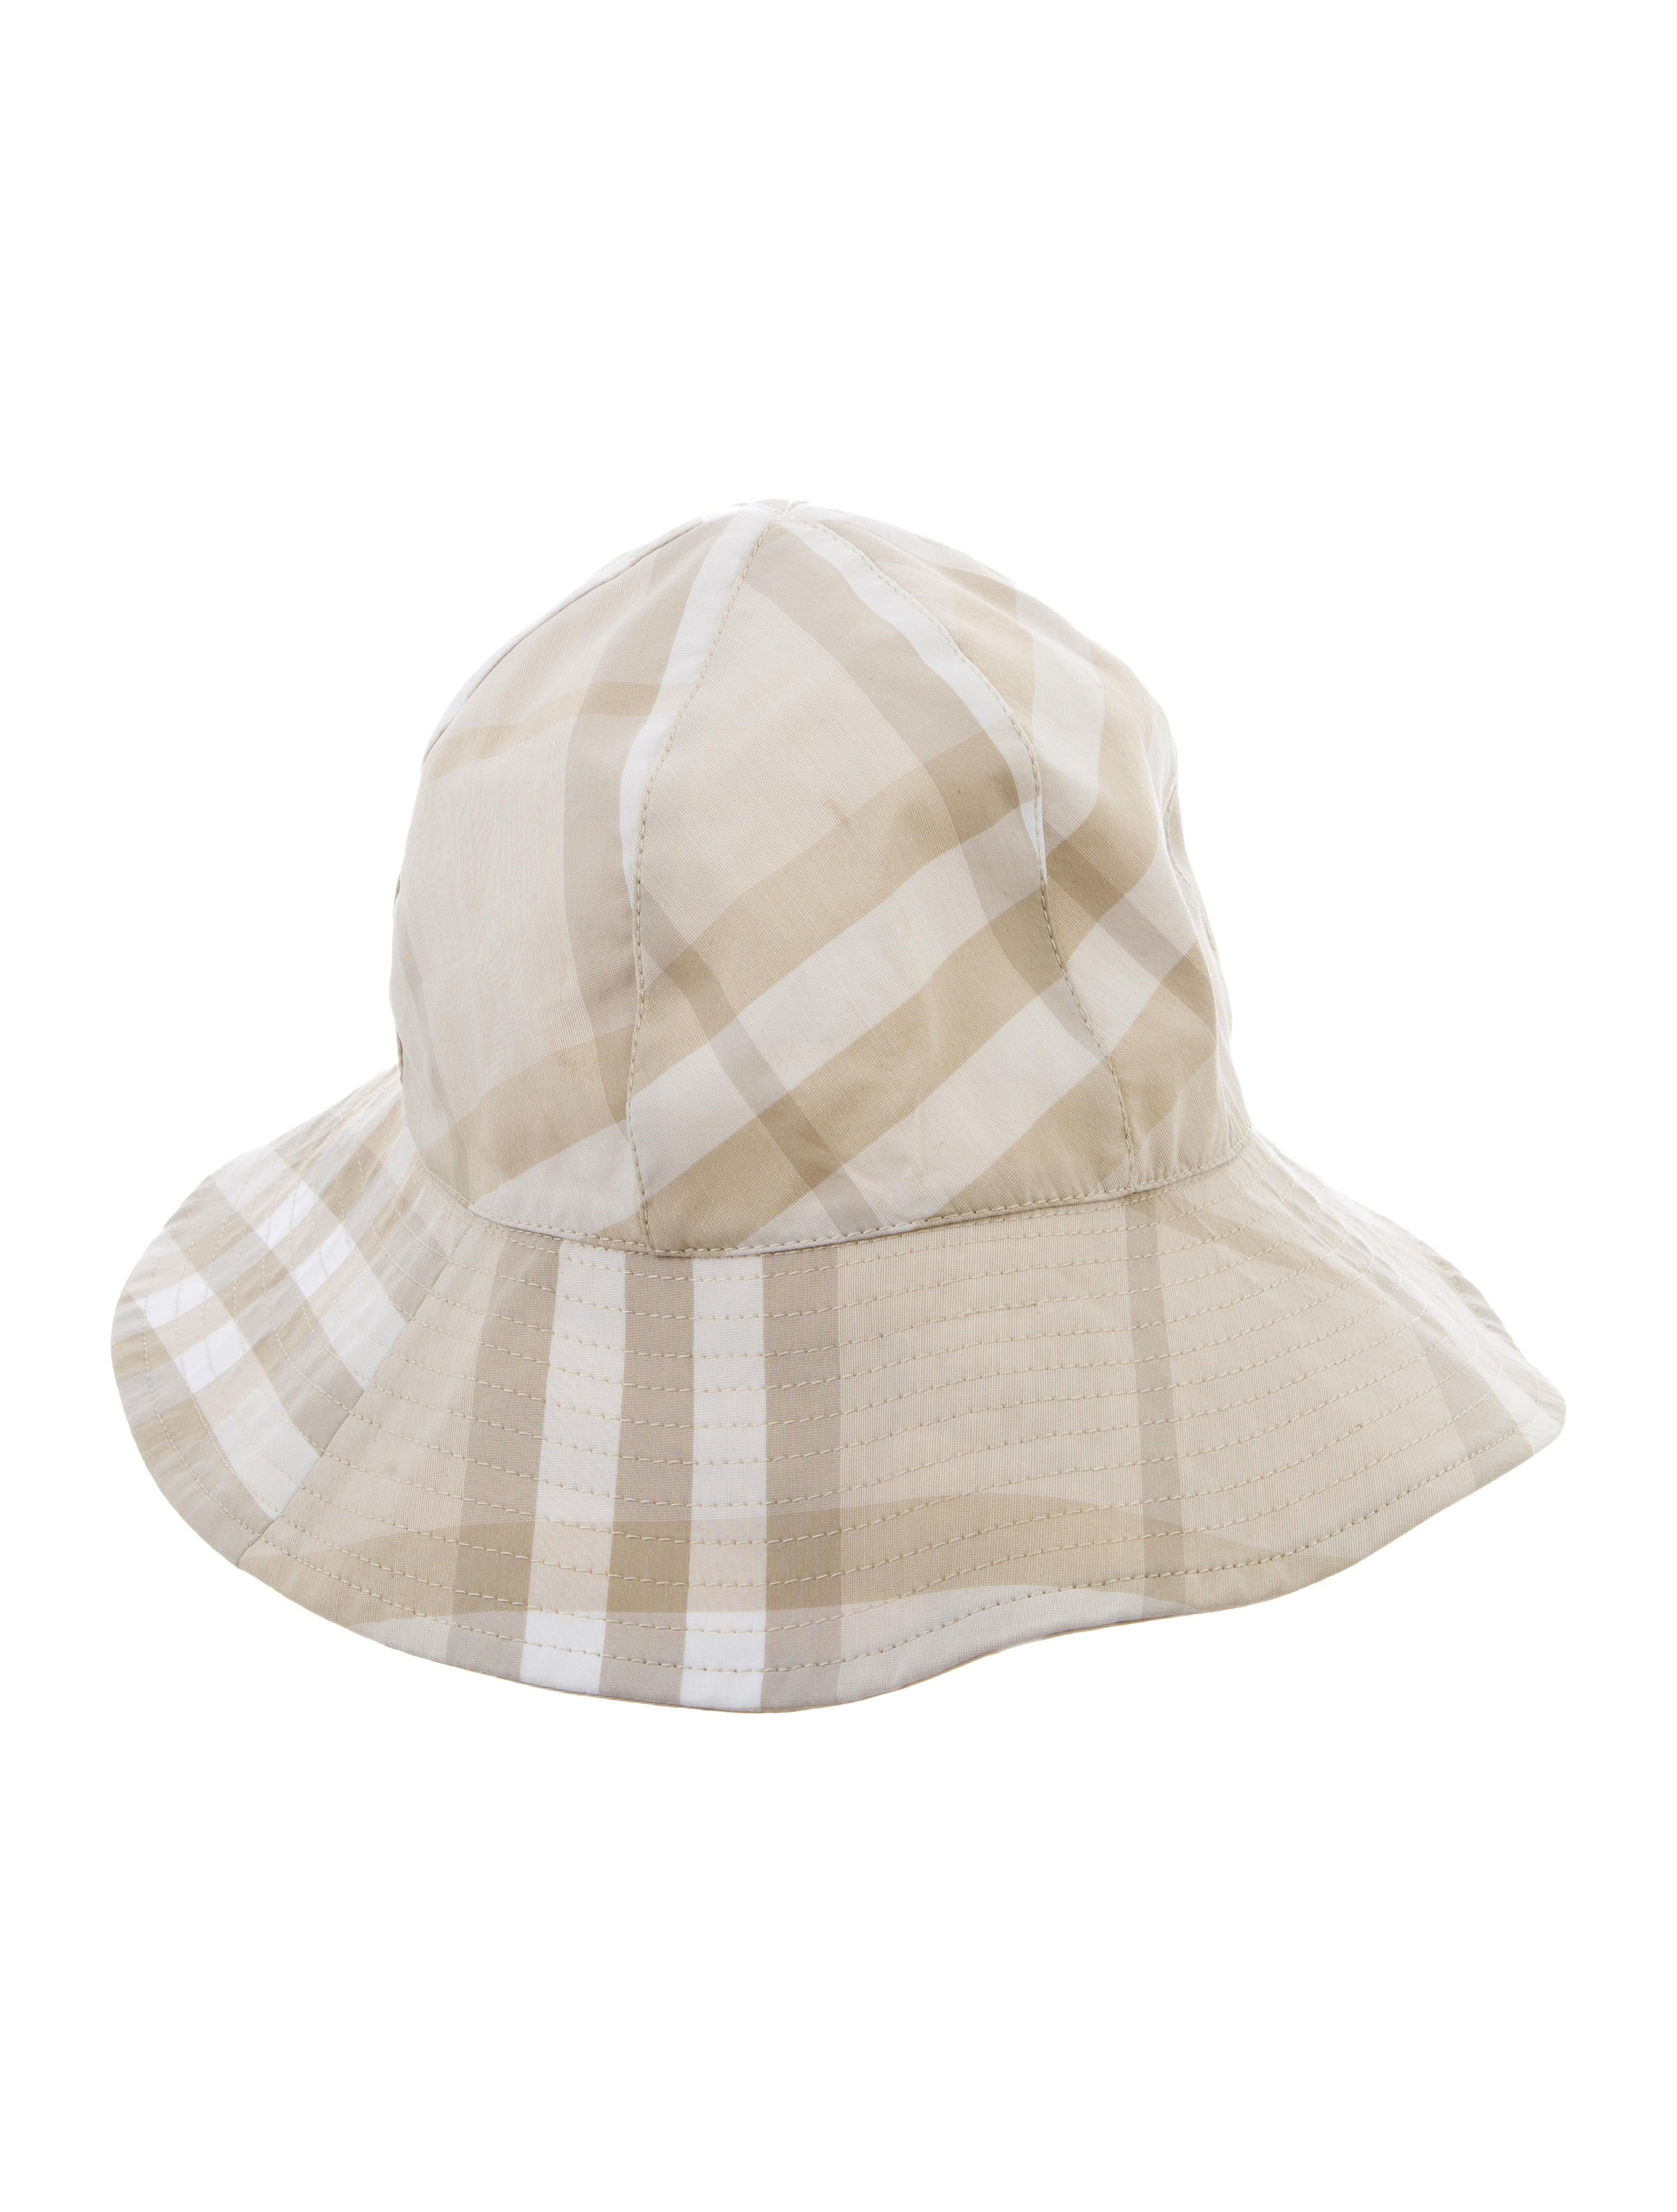 Burberry Nova Check Bucket Hat - Accessories - BUR86590  dd77ab5ca38